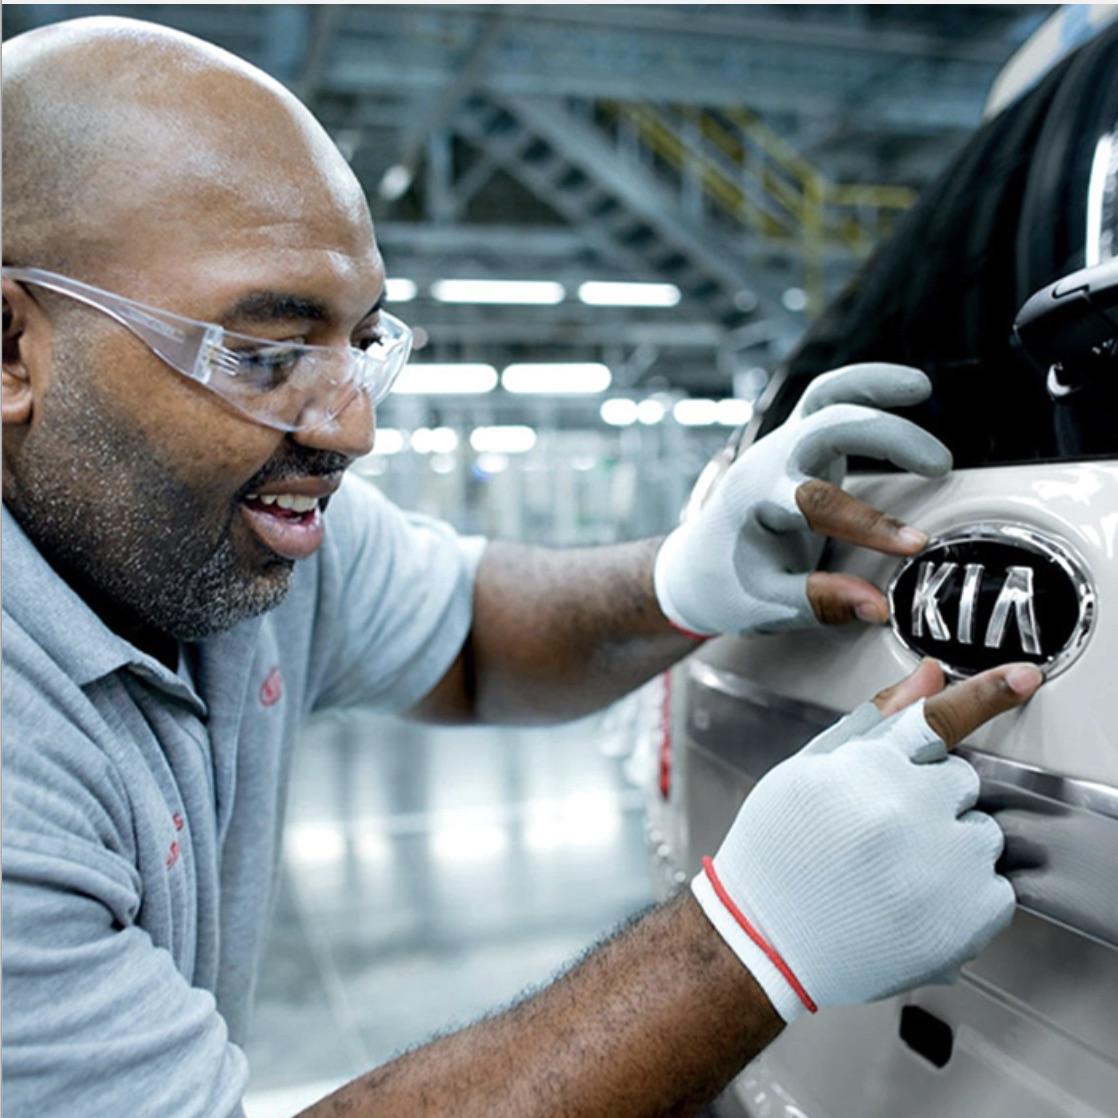 Man taking care of a Kia vehicle as part of Kia's warranty program at Gateway Kia of Denville.